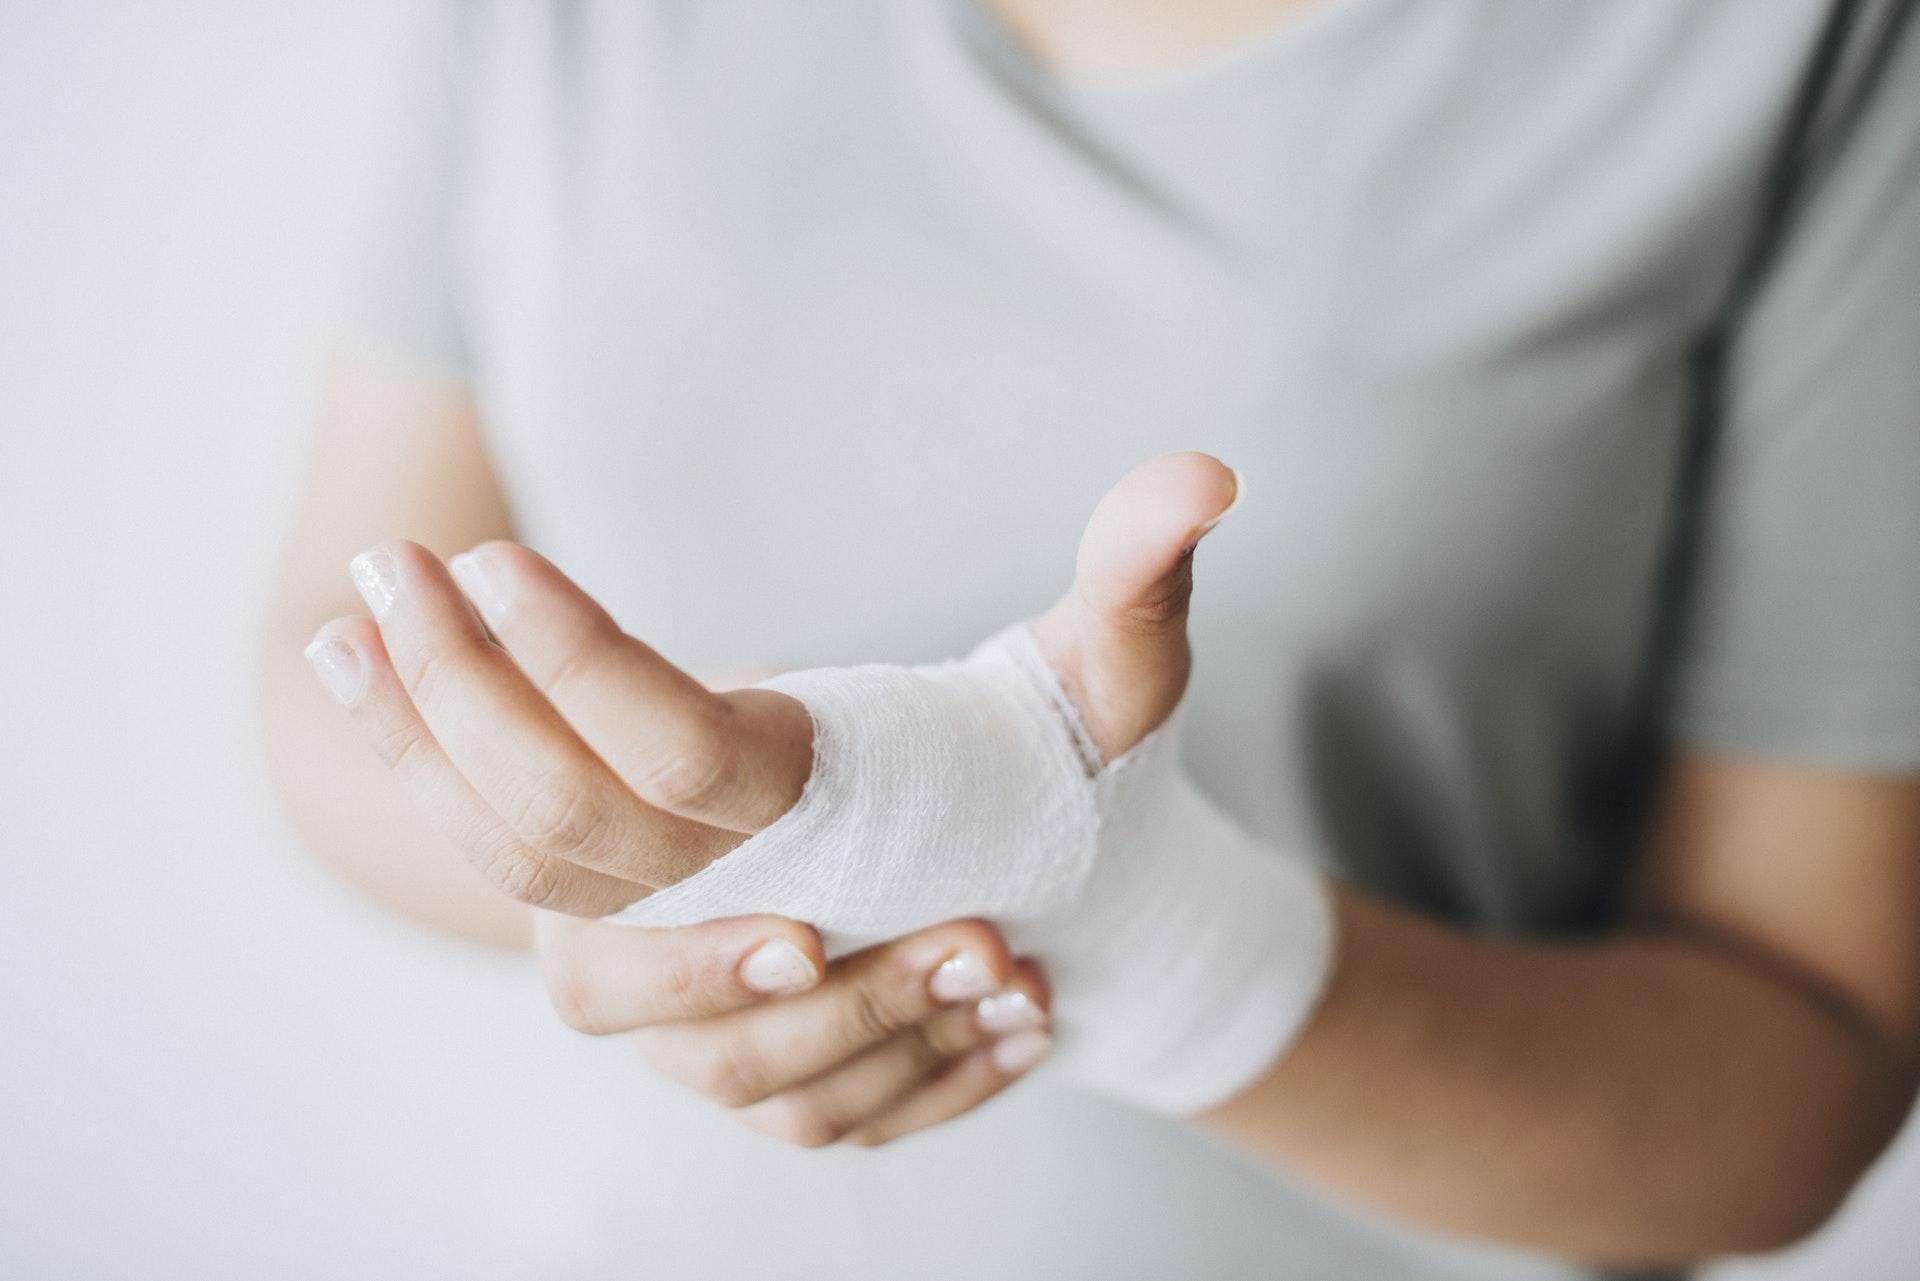 injured-hand-in-bandage